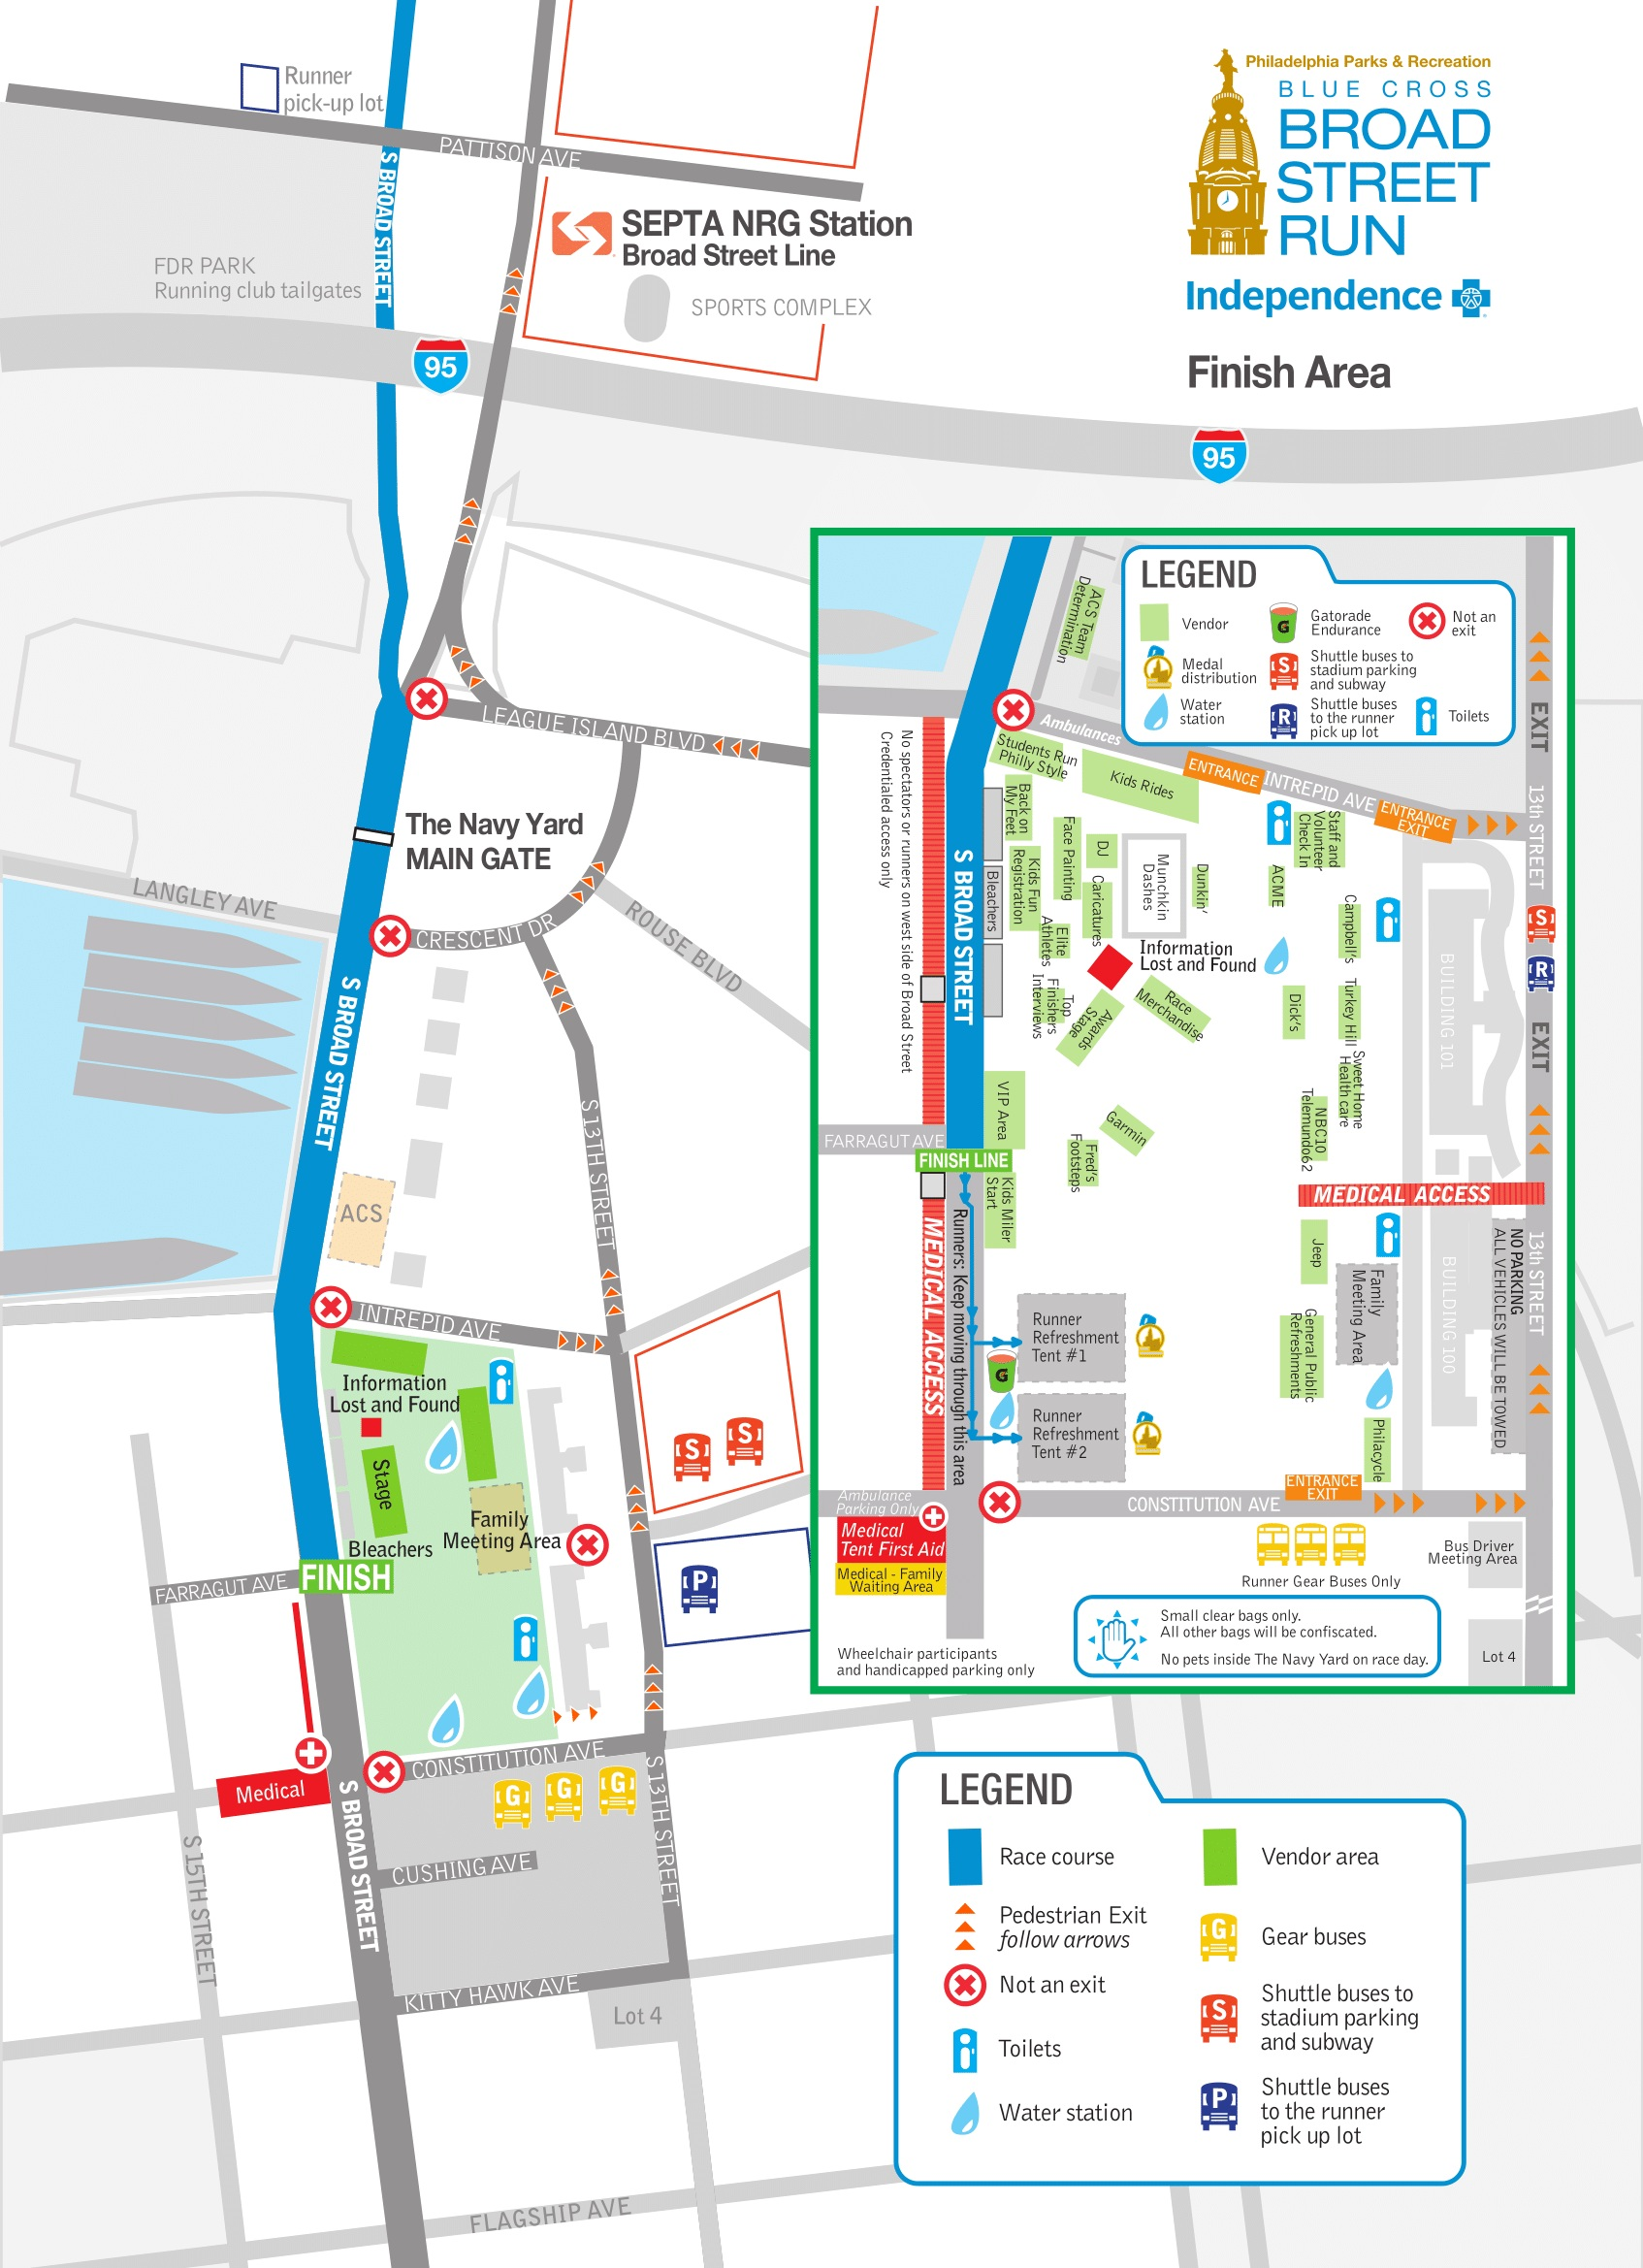 Finish Area Map via Broad Street Run